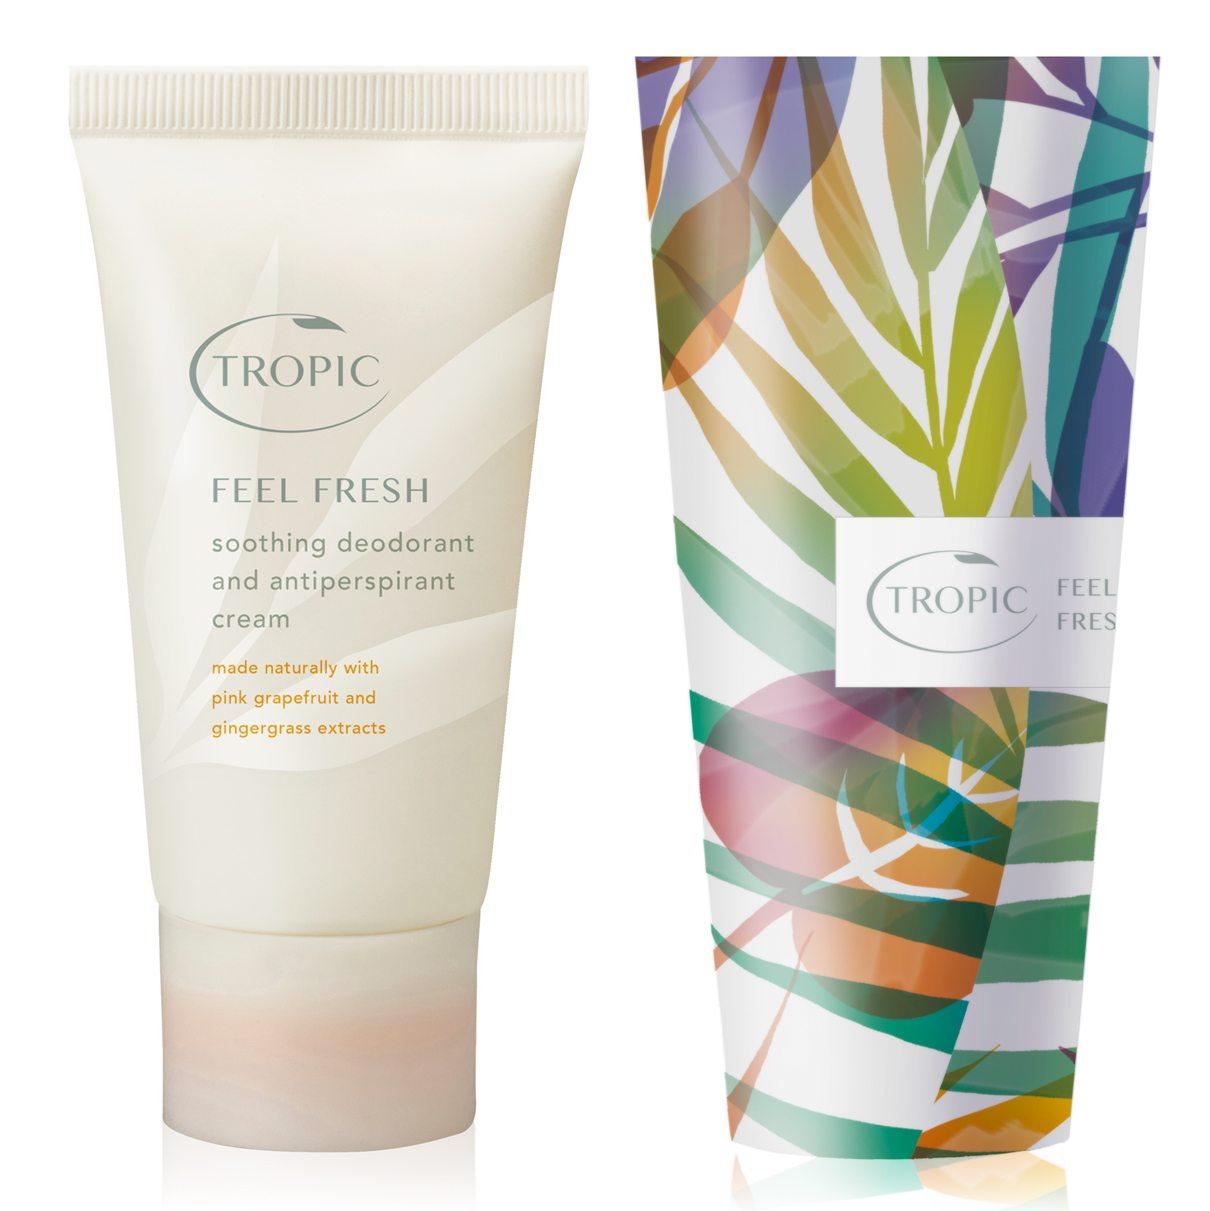 Feel Fresh Soothing Deodorant And Antiperspirant